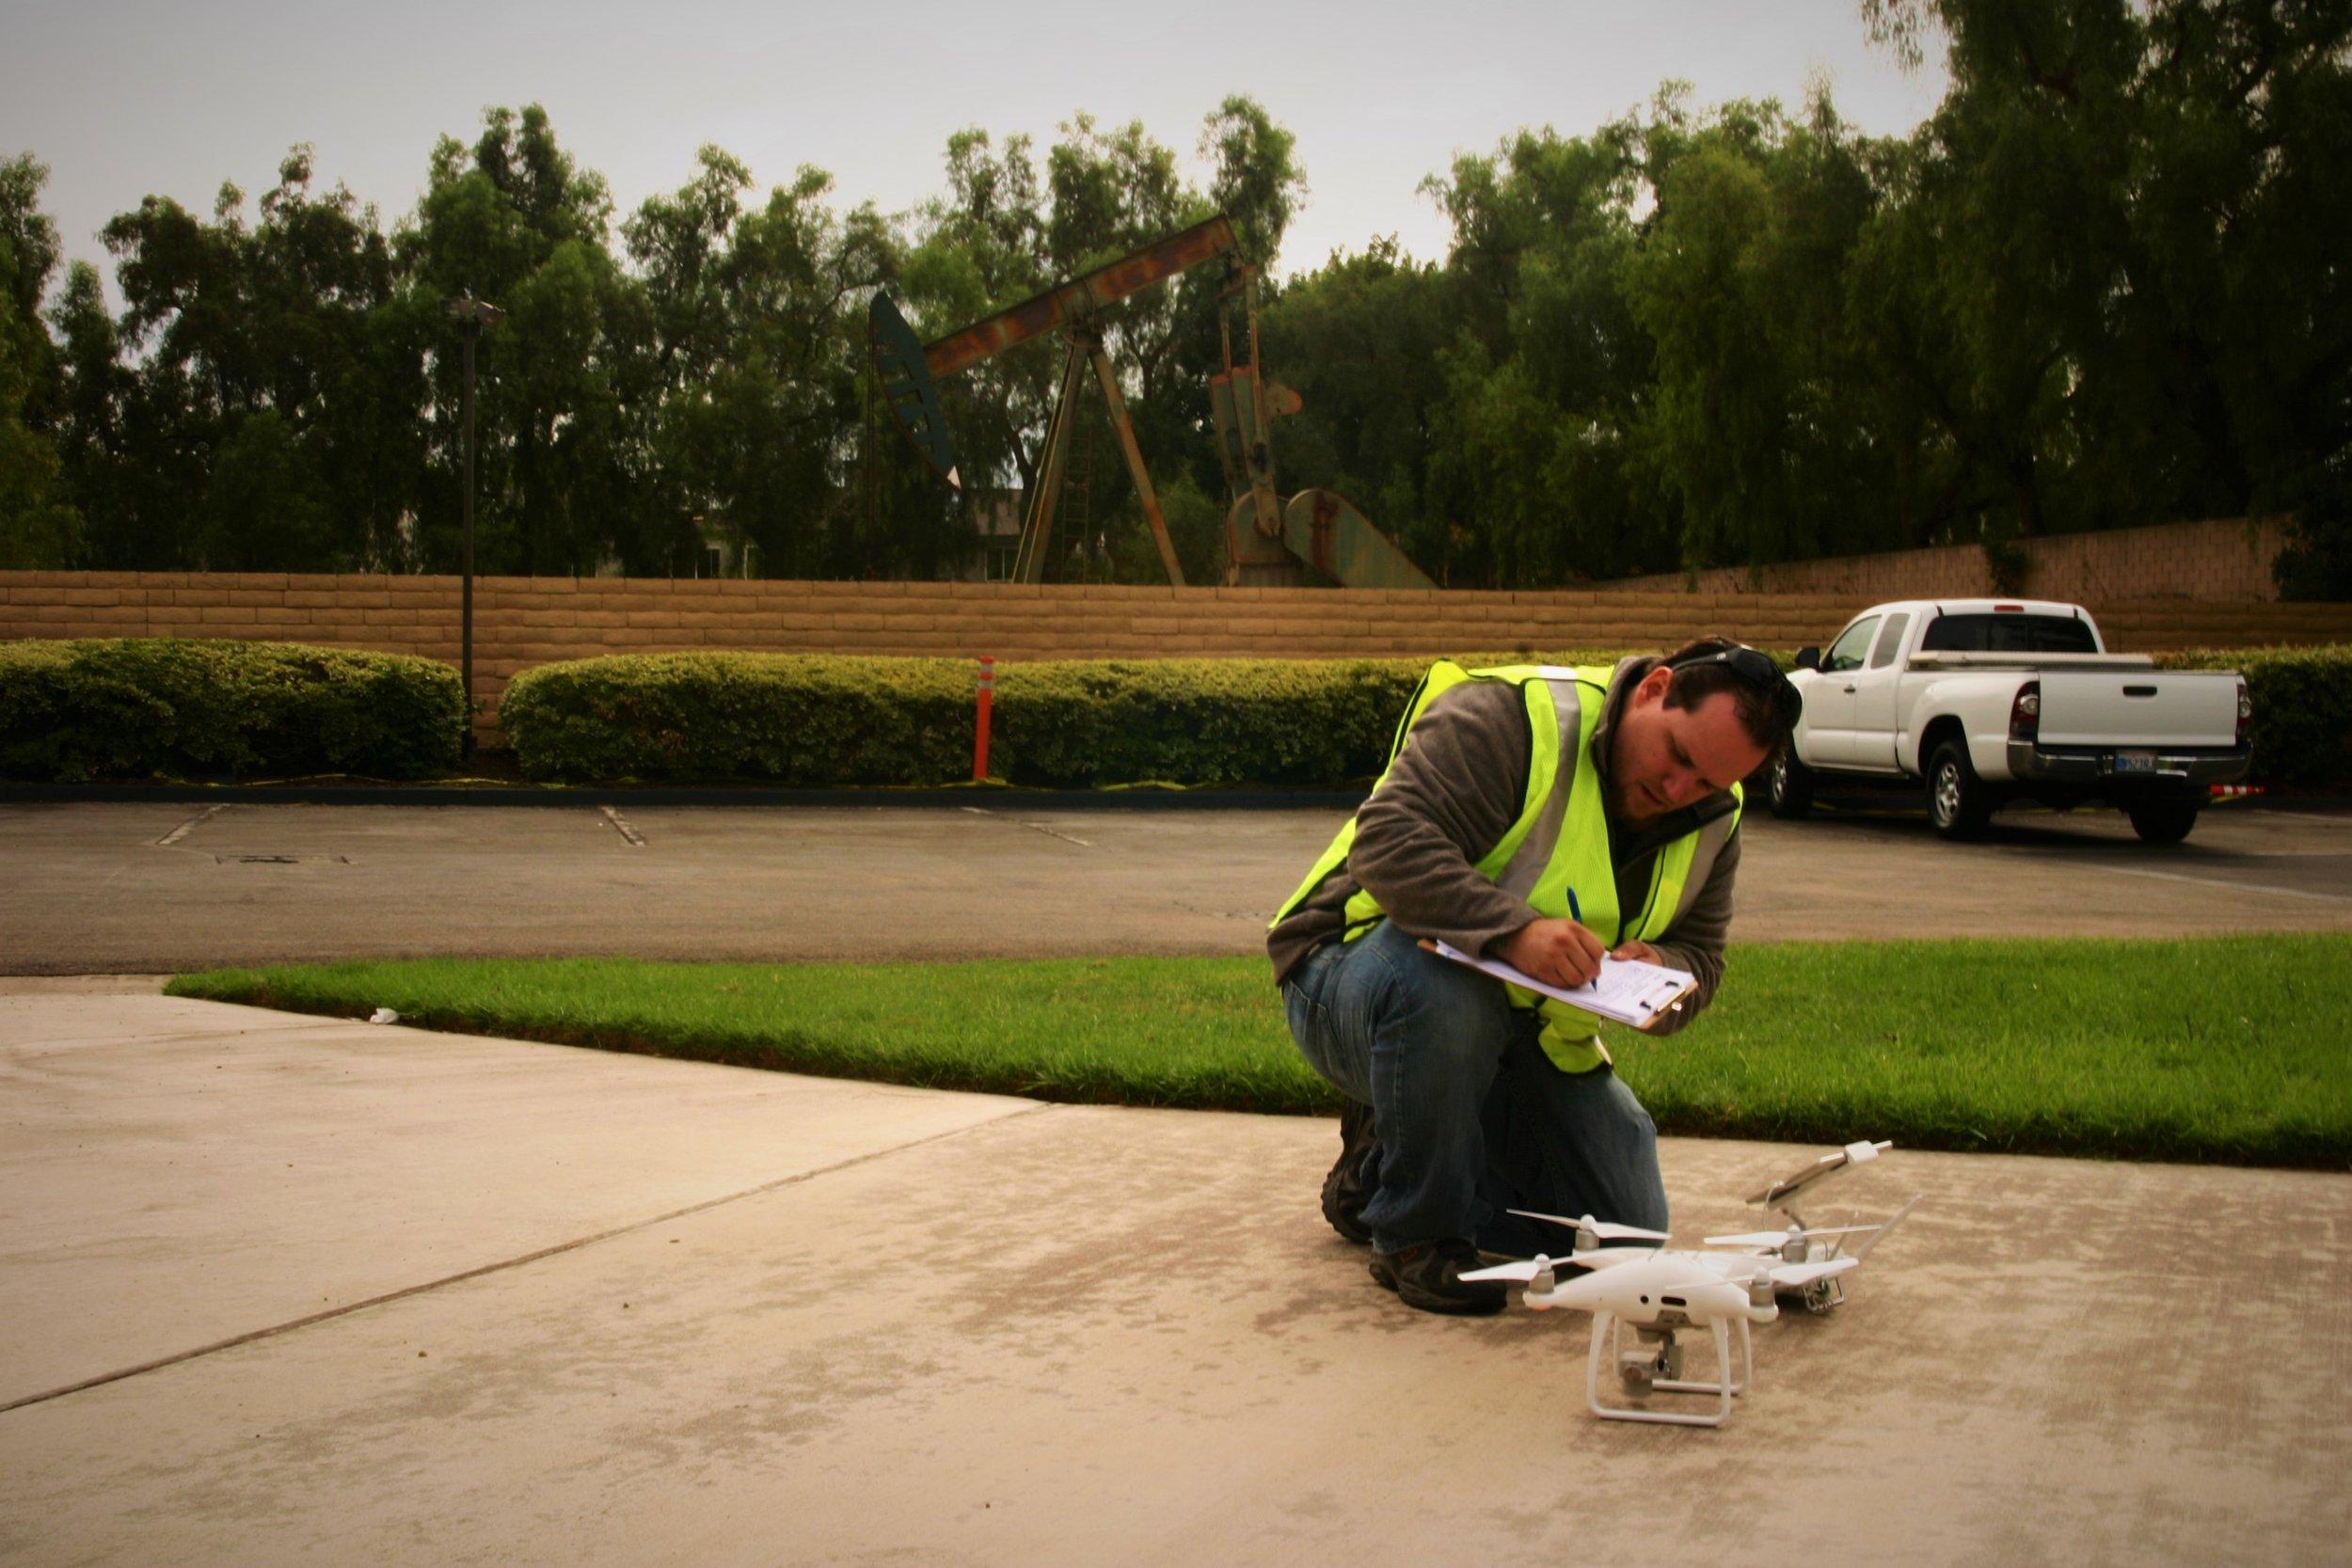 Surveyor drone pilot